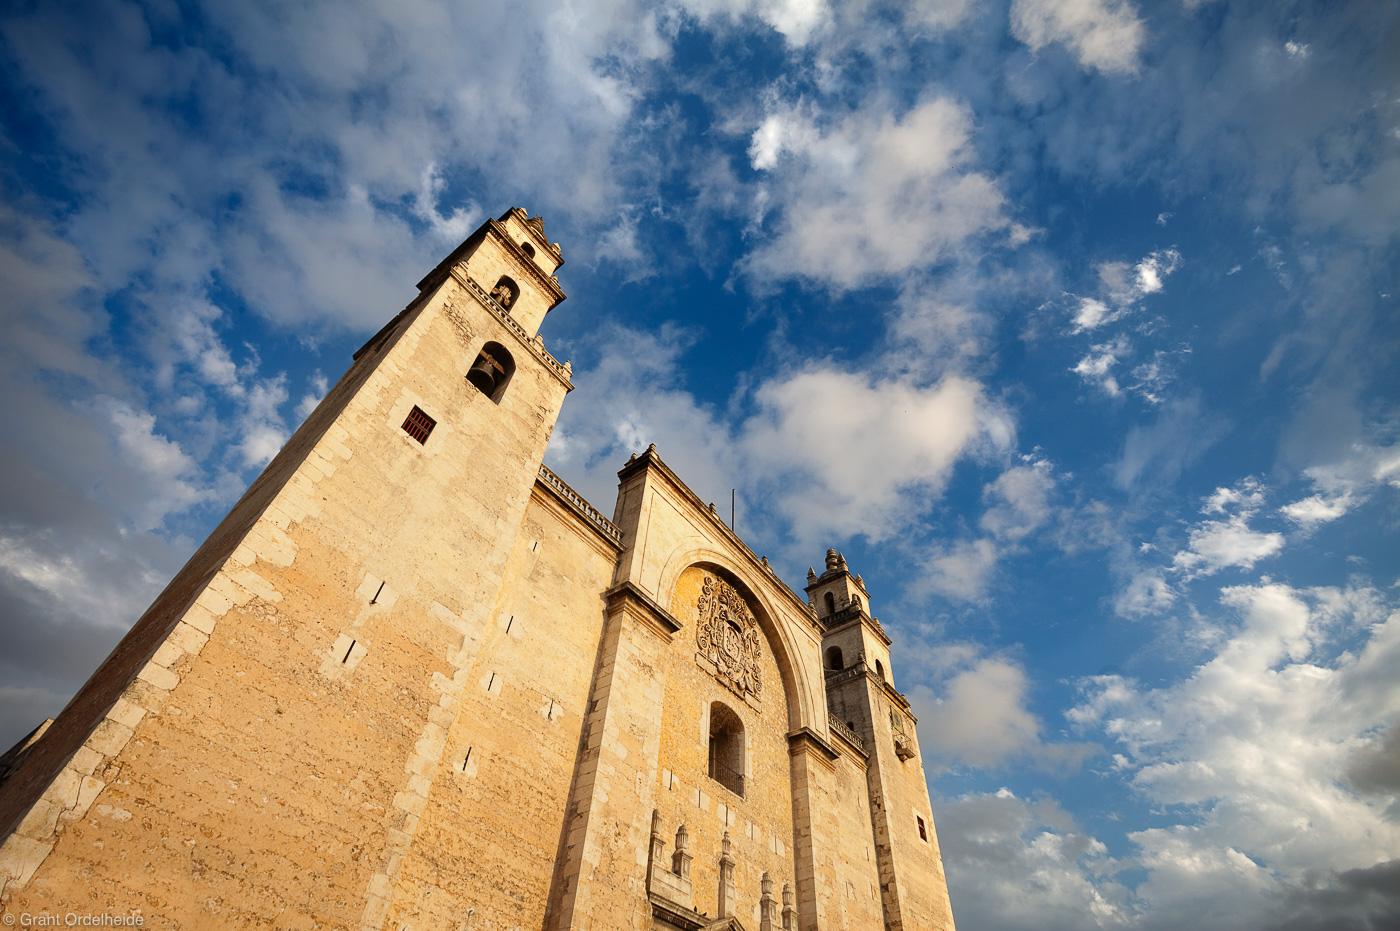 merida, cathedral, merida, yucatan, mexico, church, oldest, americas, worship, community, photo